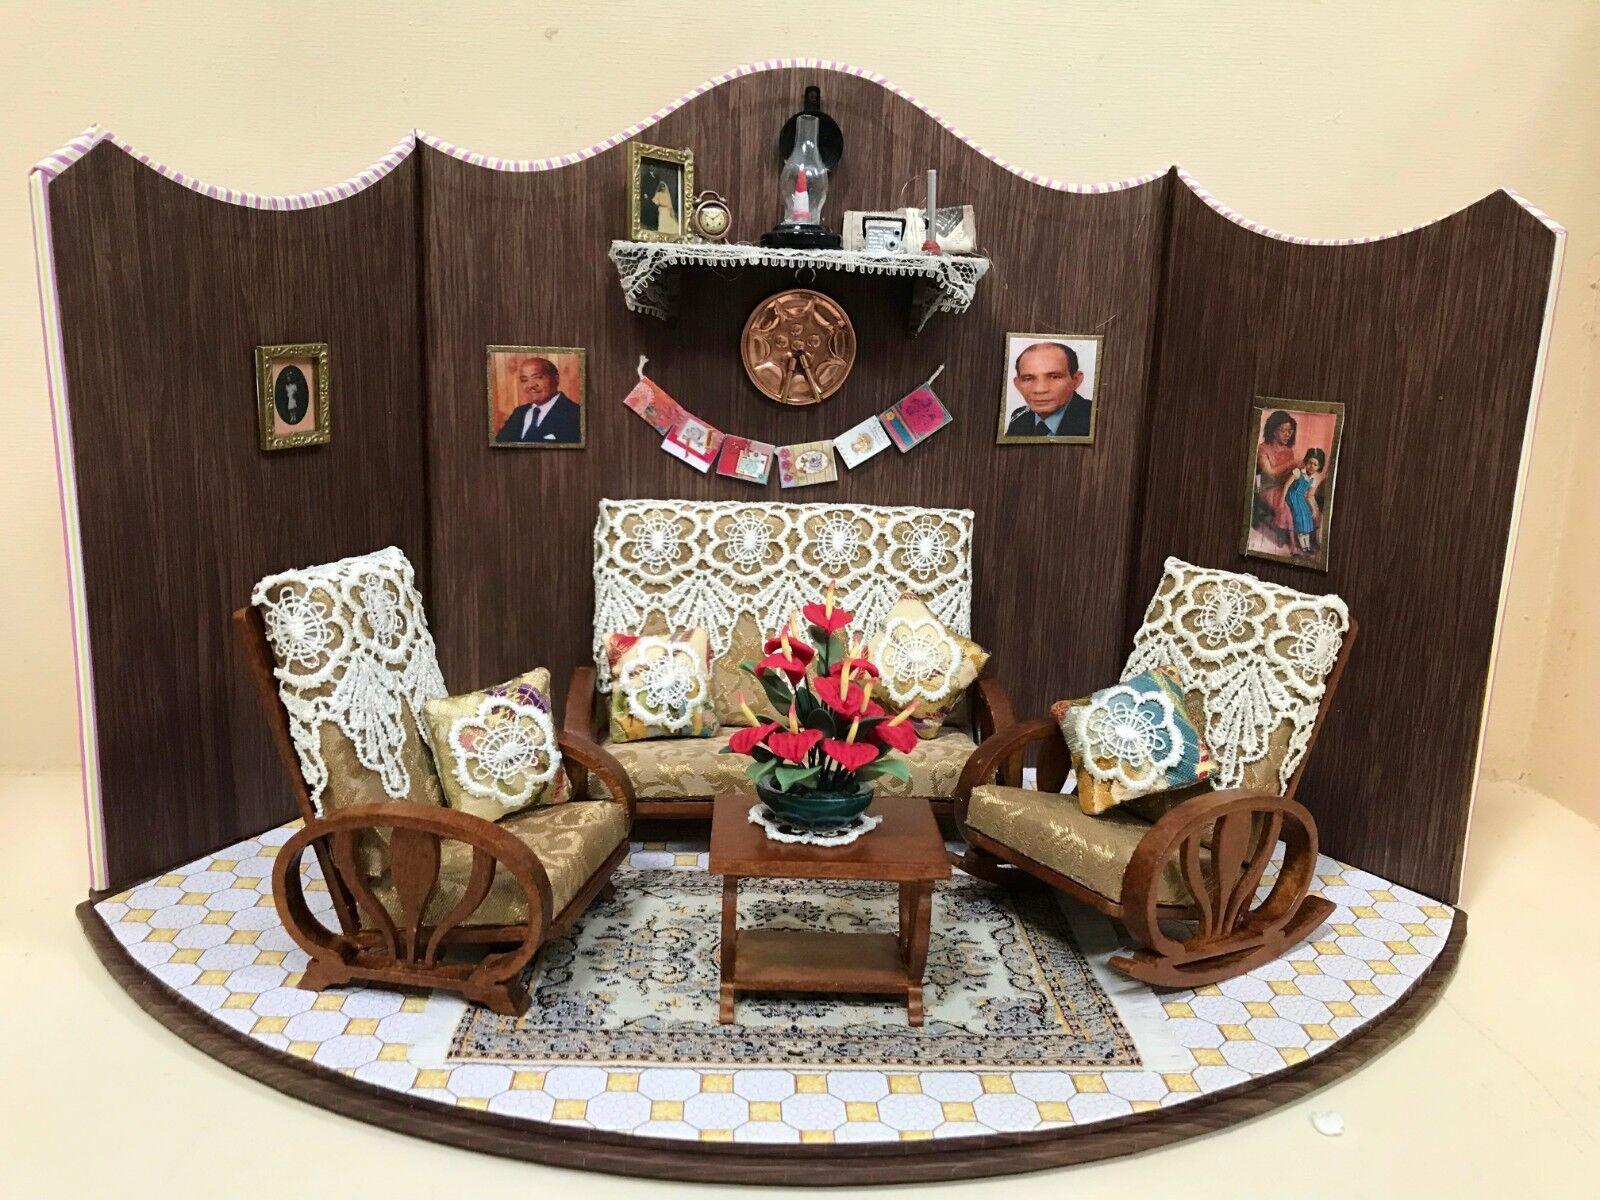 Traditional Trinidad Vintage Morris Chairs  Miniature Living Room Set & Vignette